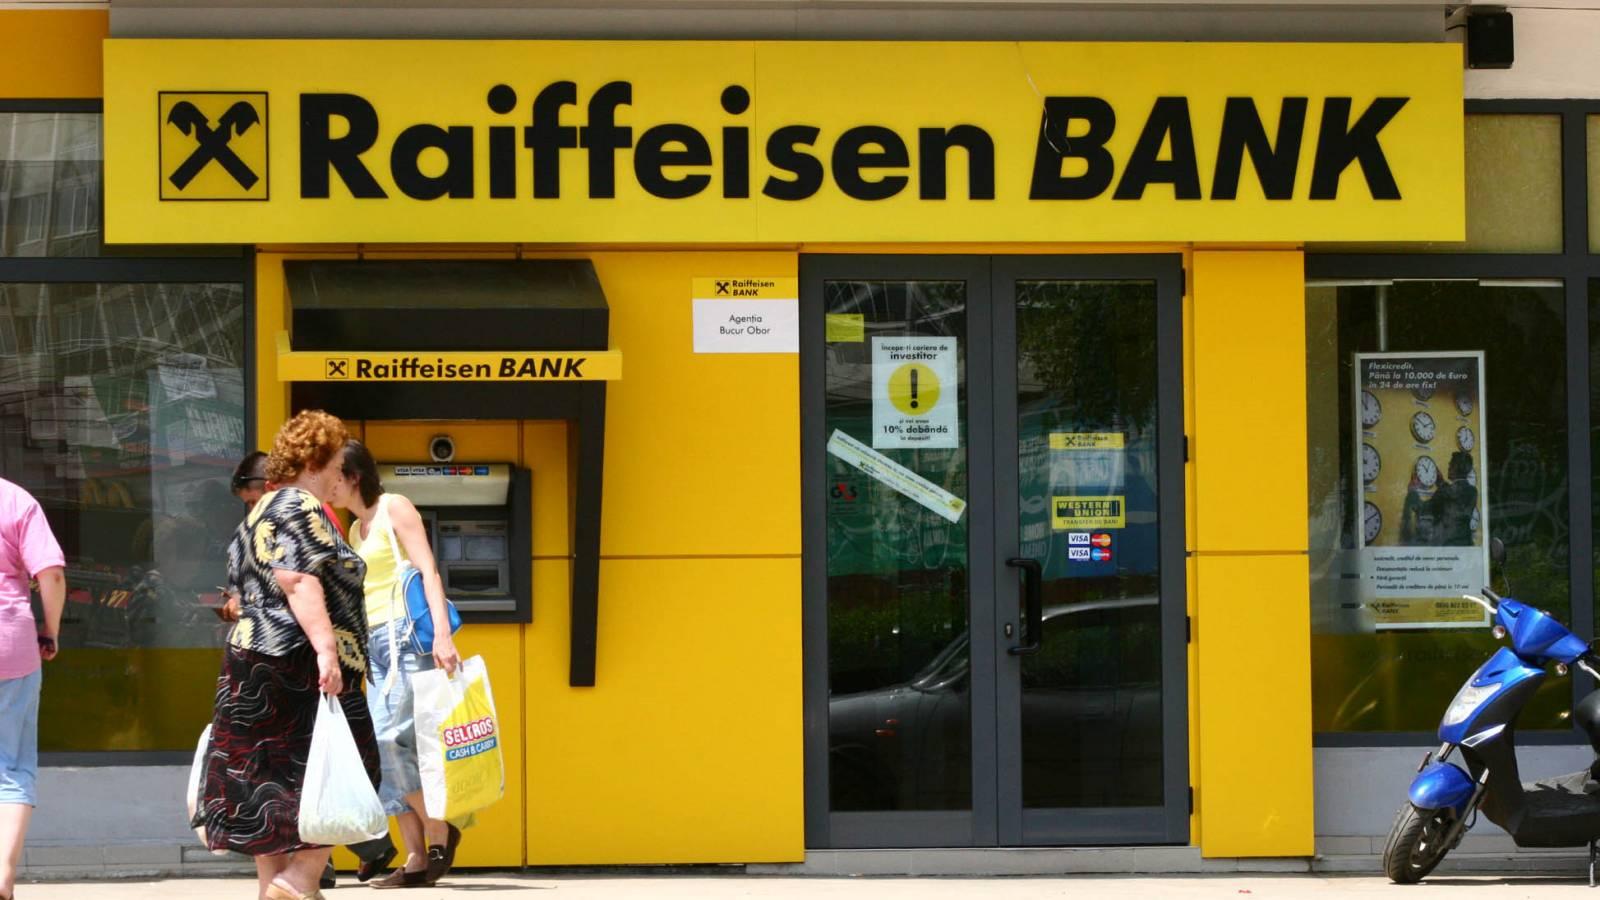 Raiffeisen Bank rompetrol